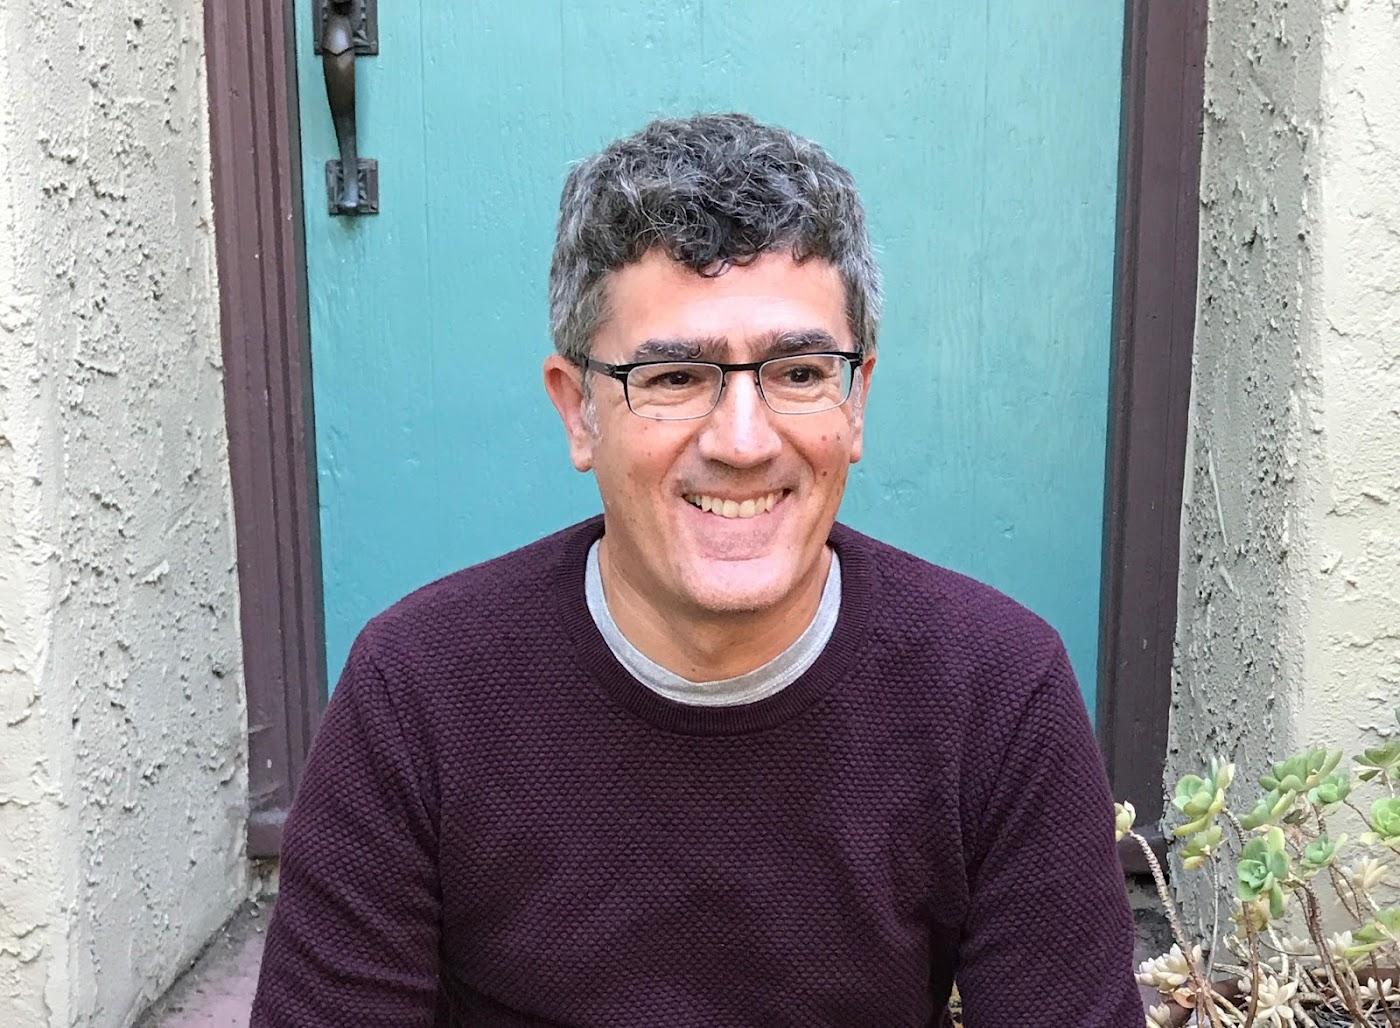 David Miller, Verily's Head of Biostatistics & Epidemiology